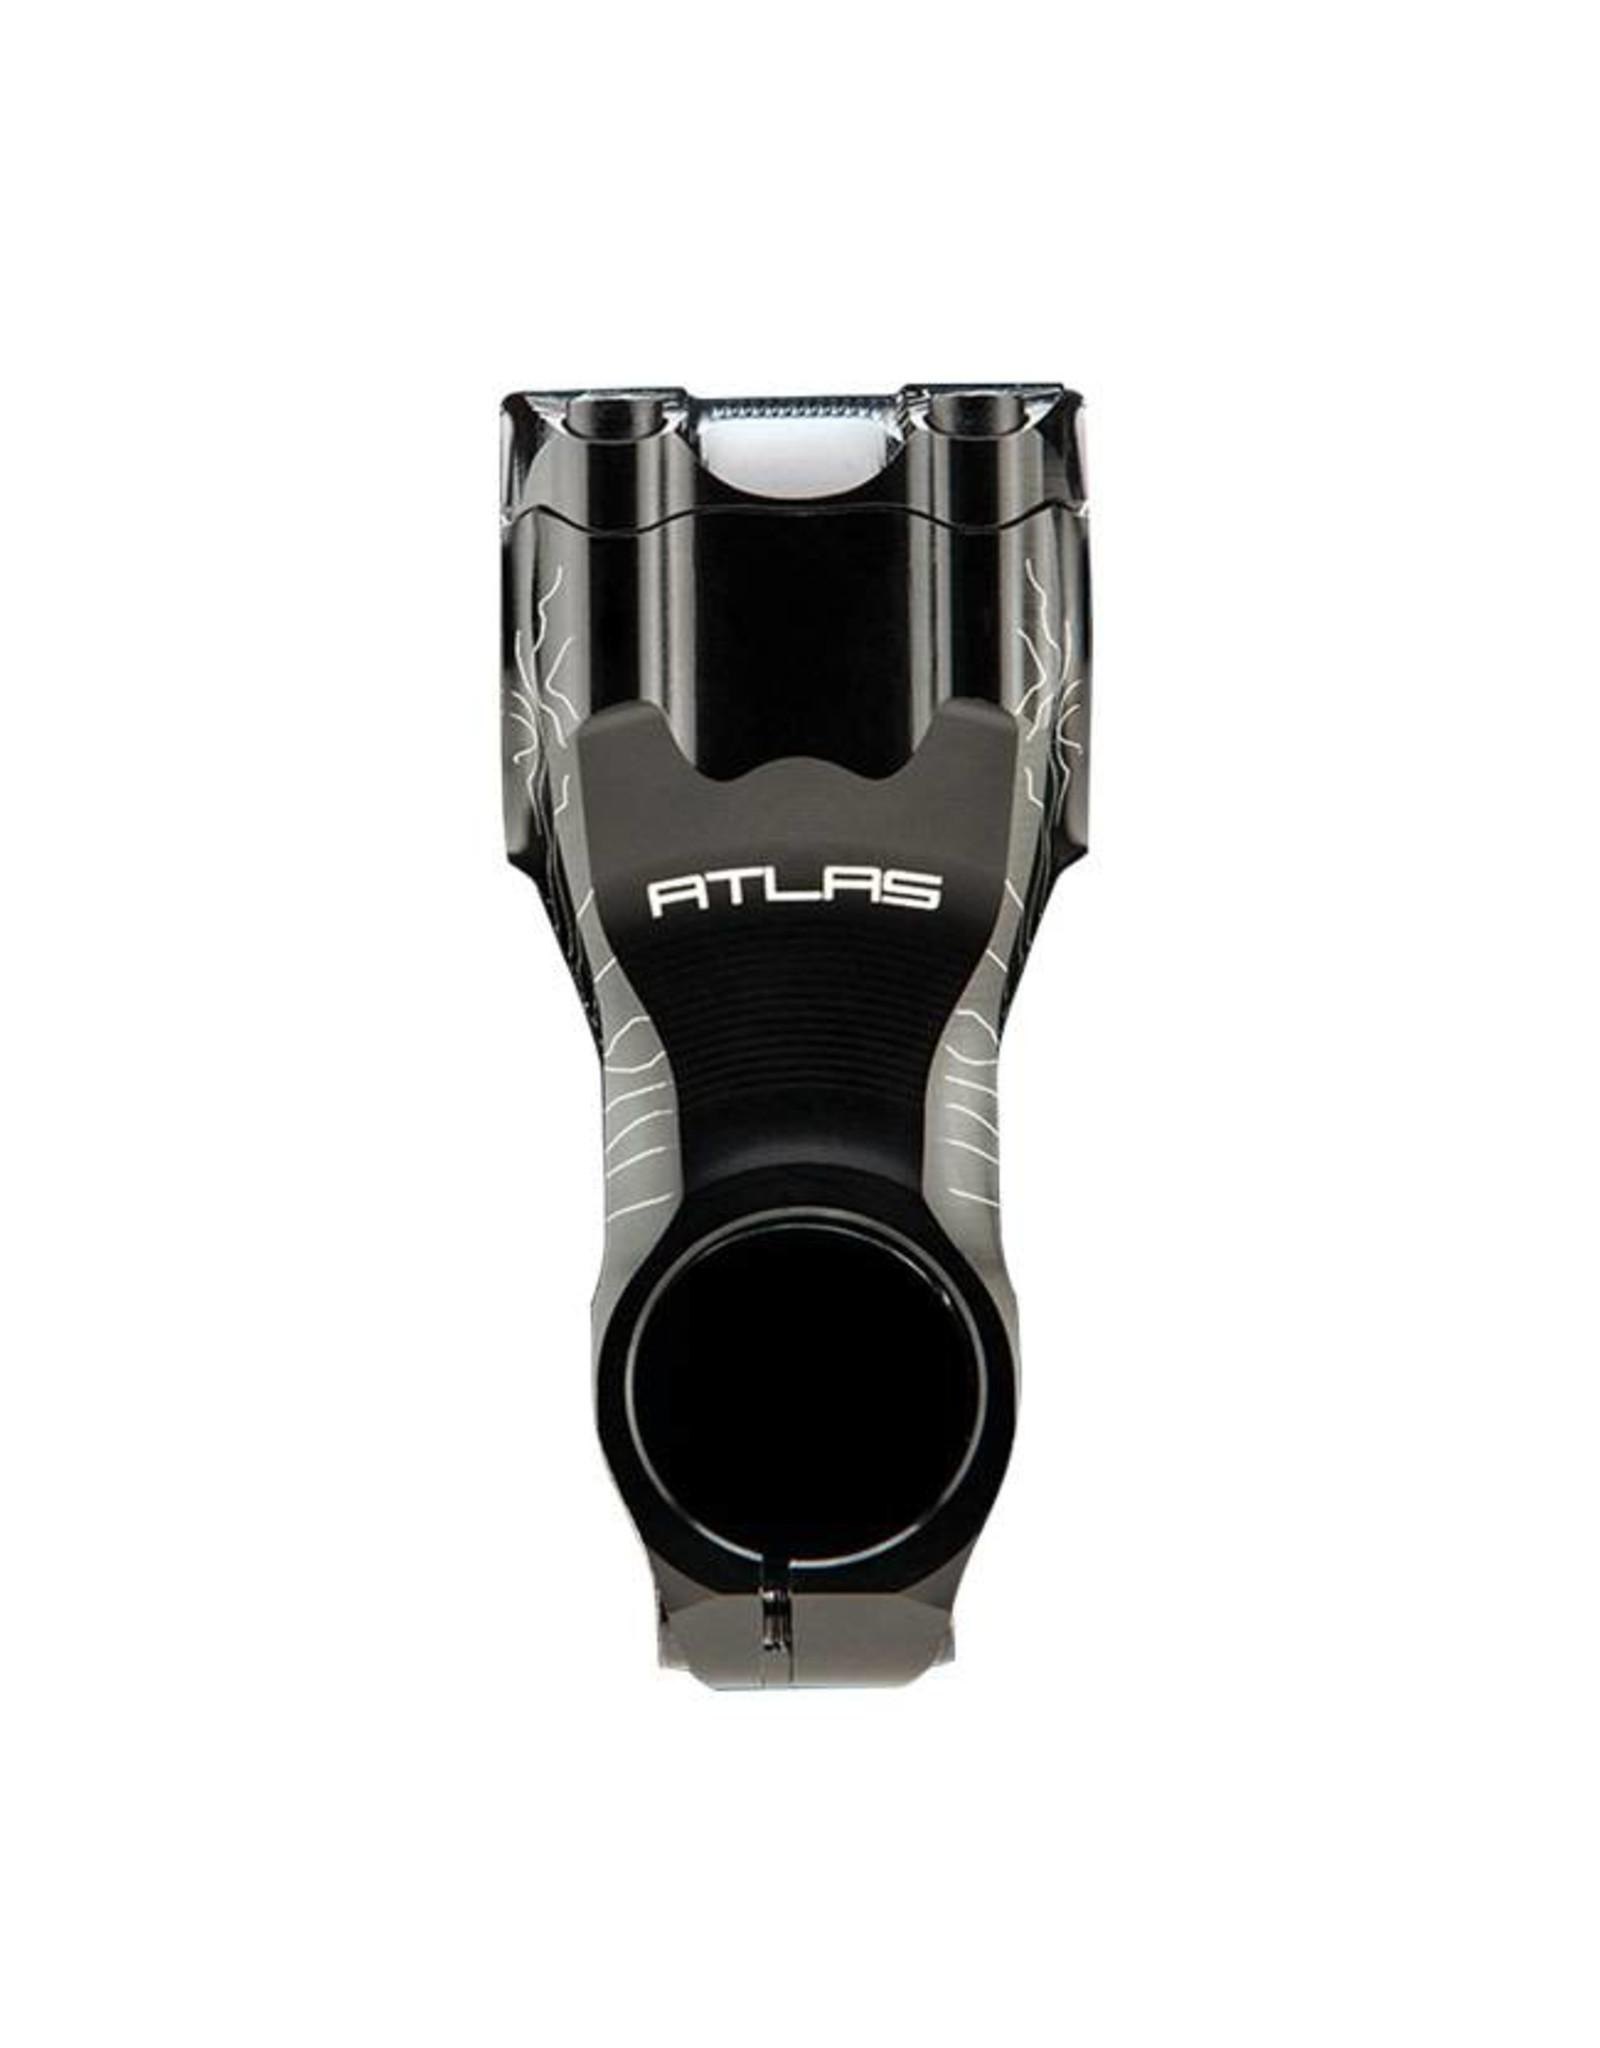 RaceFace RaceFace Atlas 35 Stem, 50mm +/- 0 degree Black